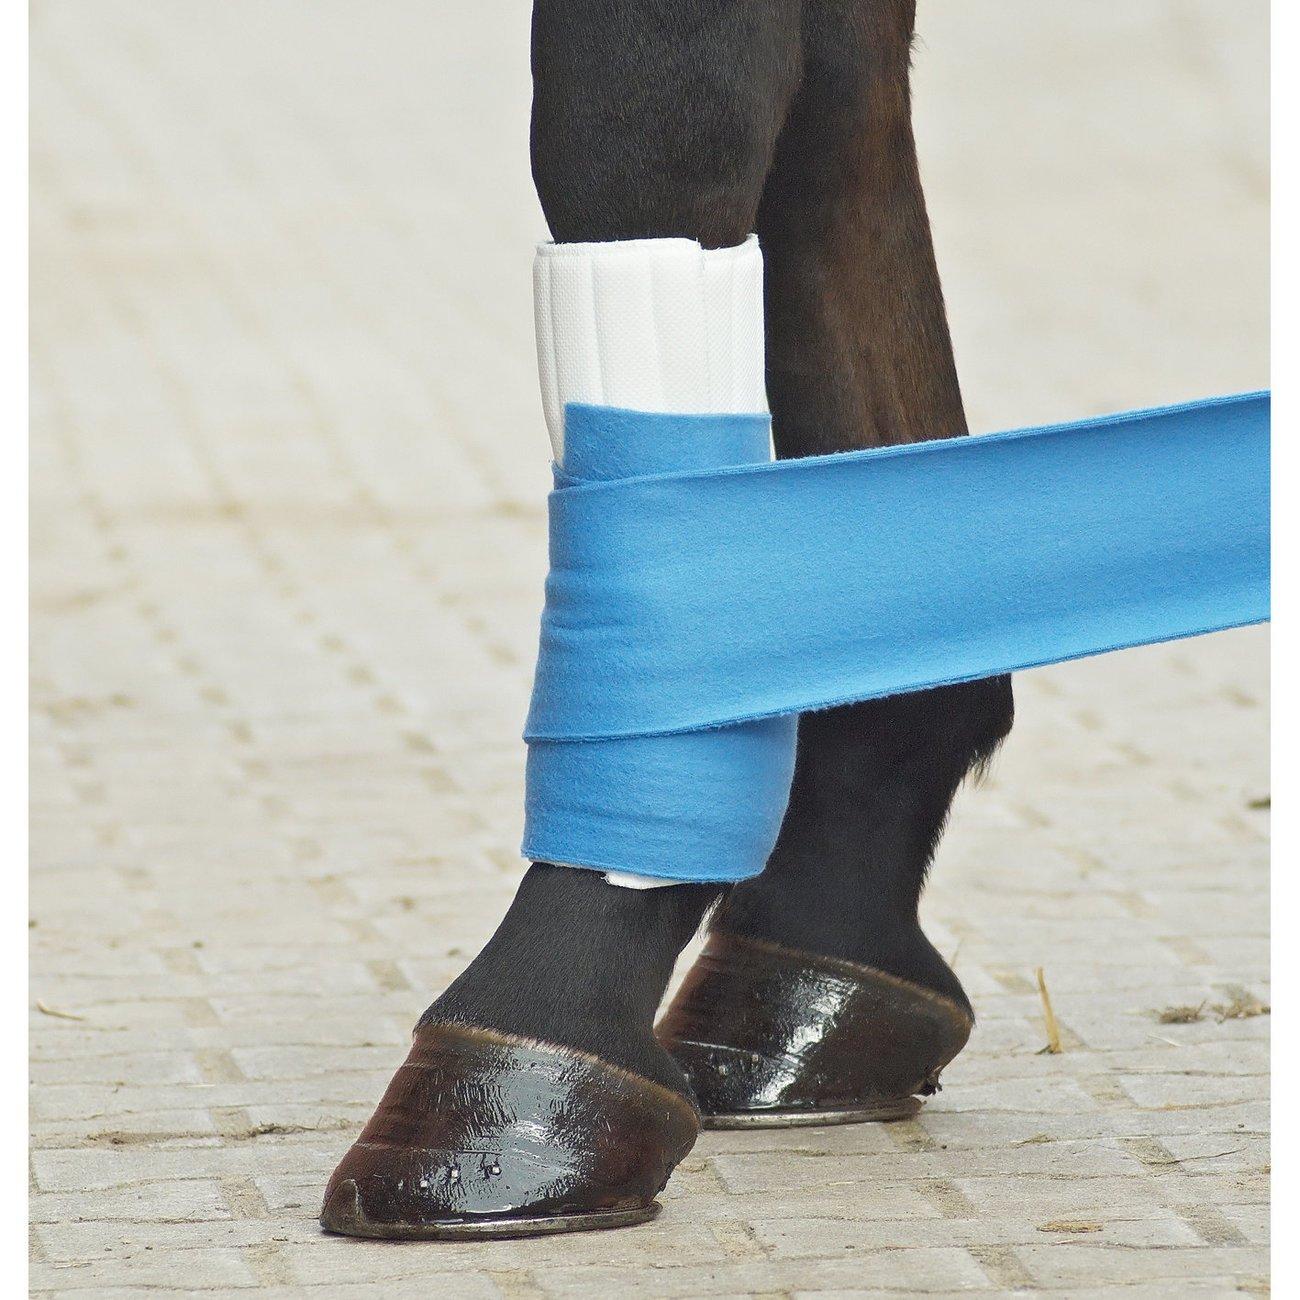 BUSSE Bandagen Unterlagen Klett, Bild 3